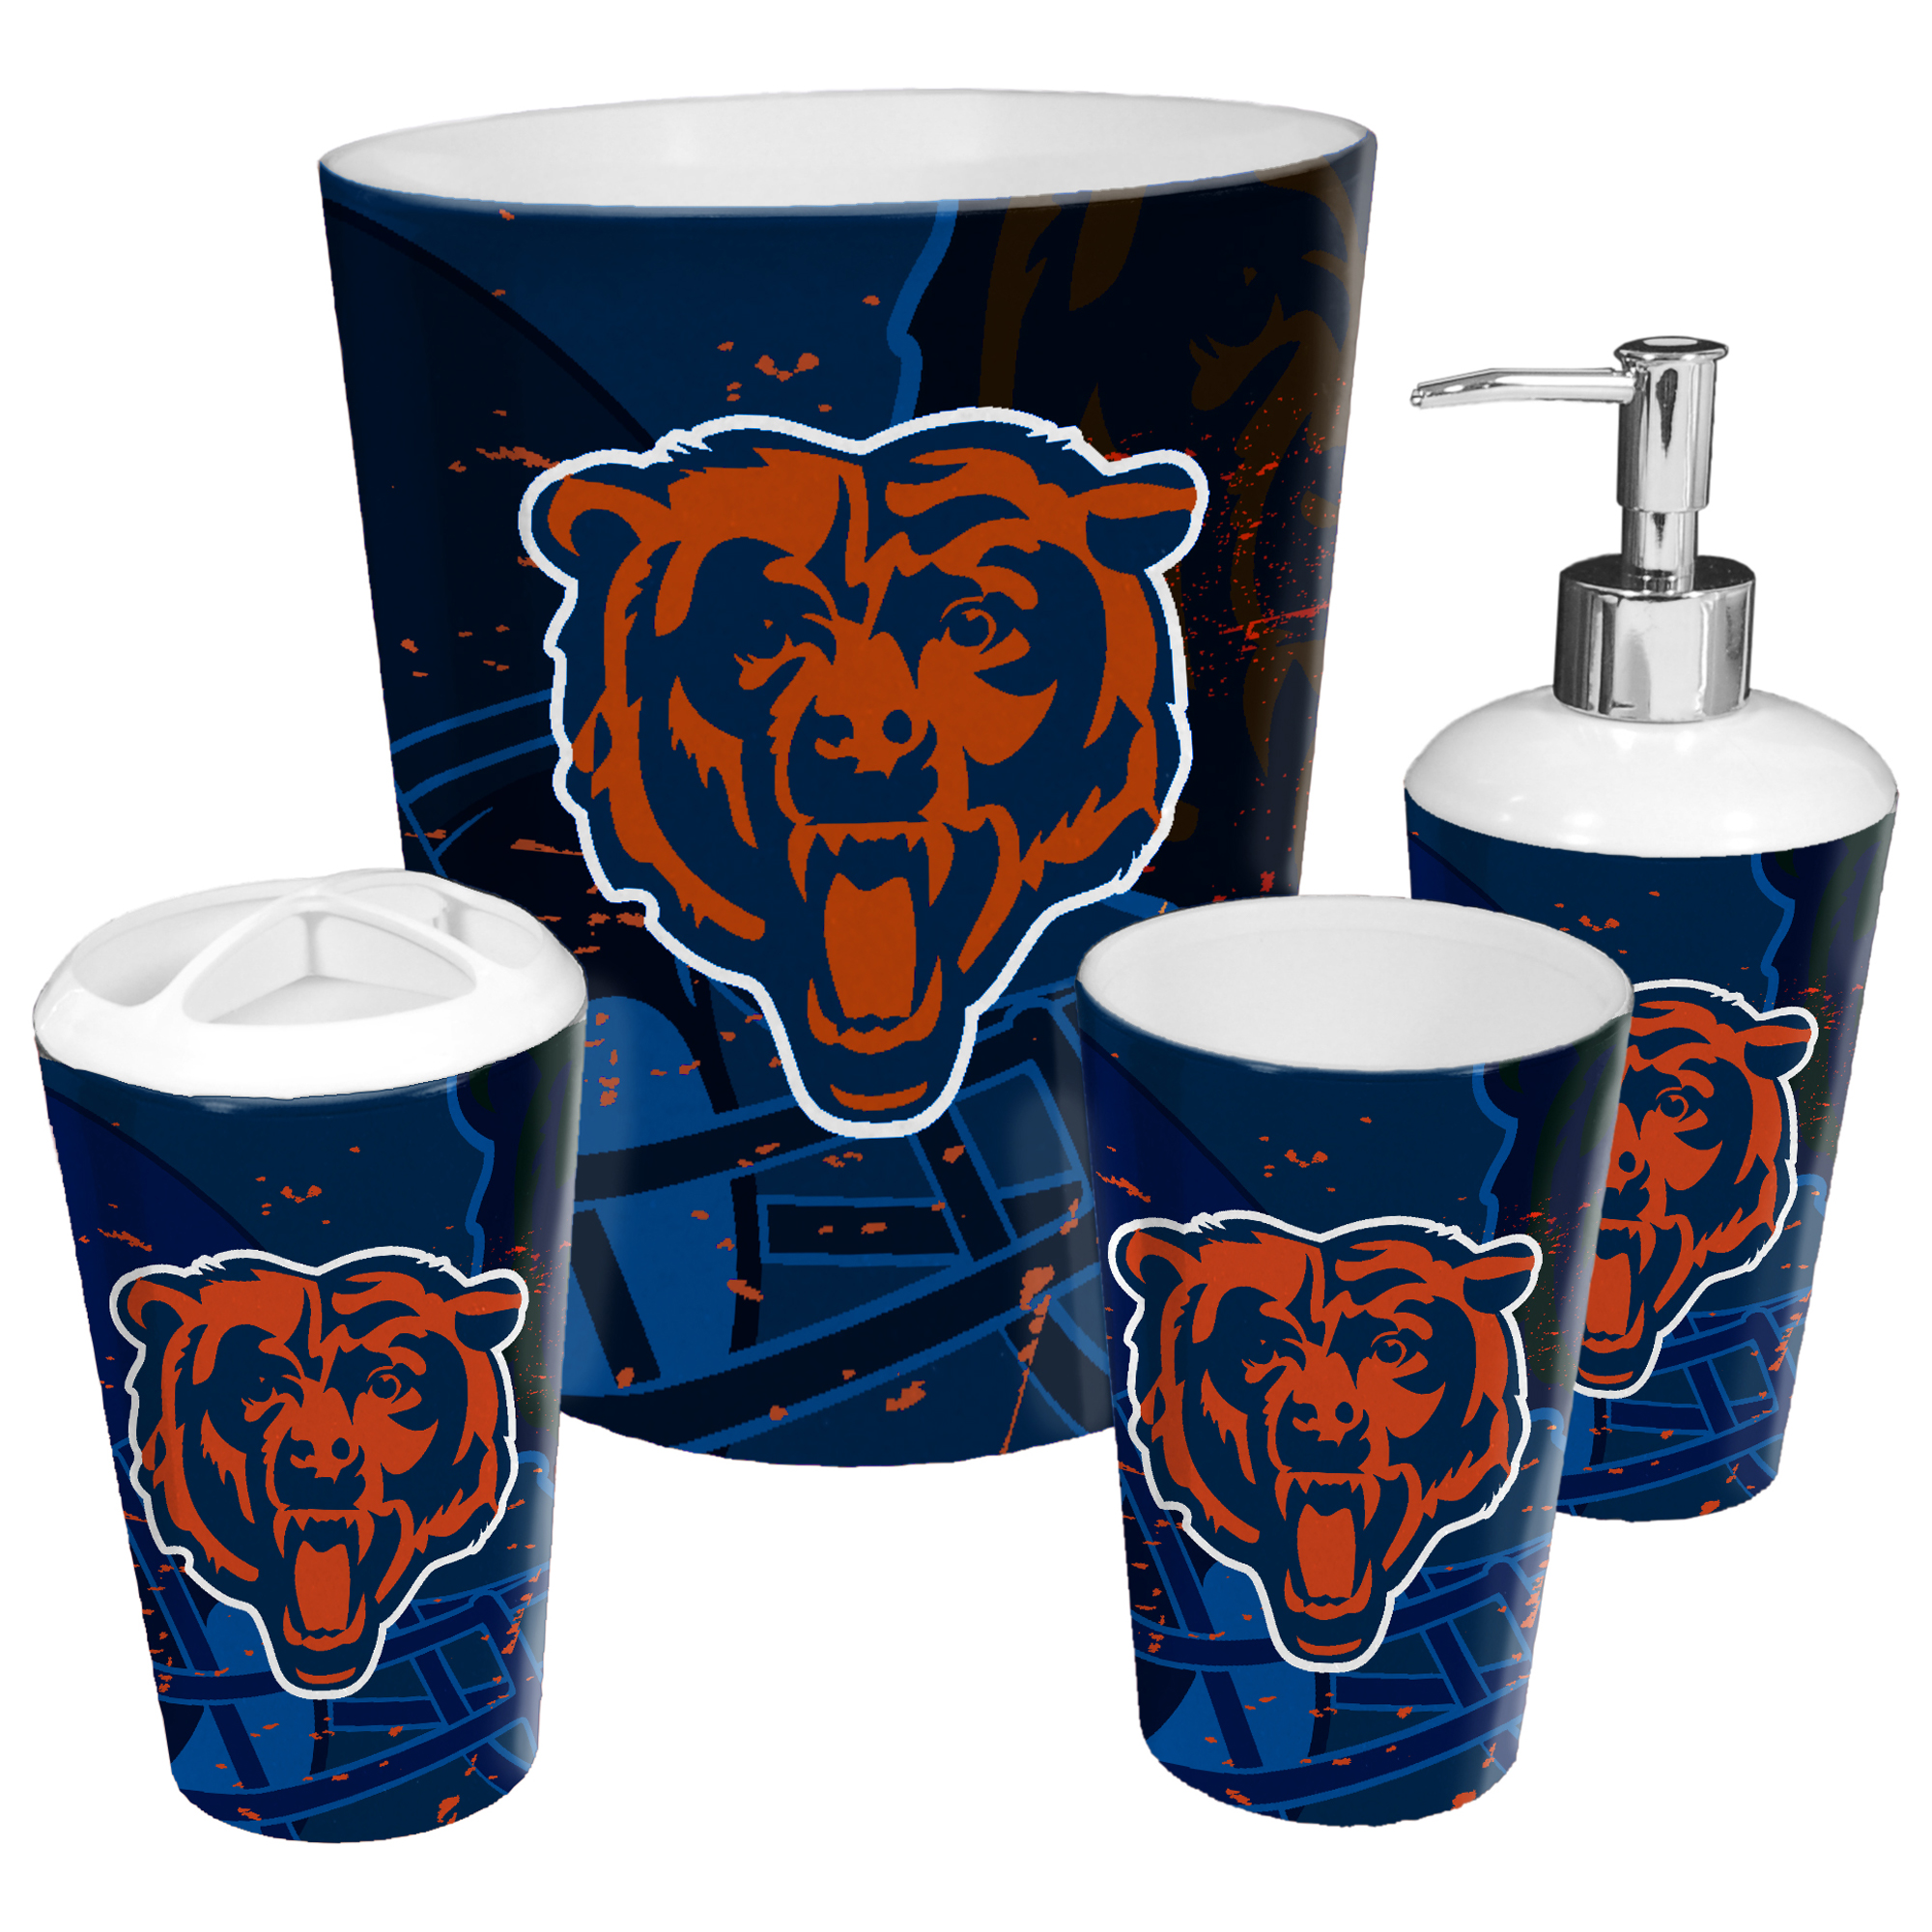 Chicago Bears The Northwest Company 4-Piece Bath Set - No Size